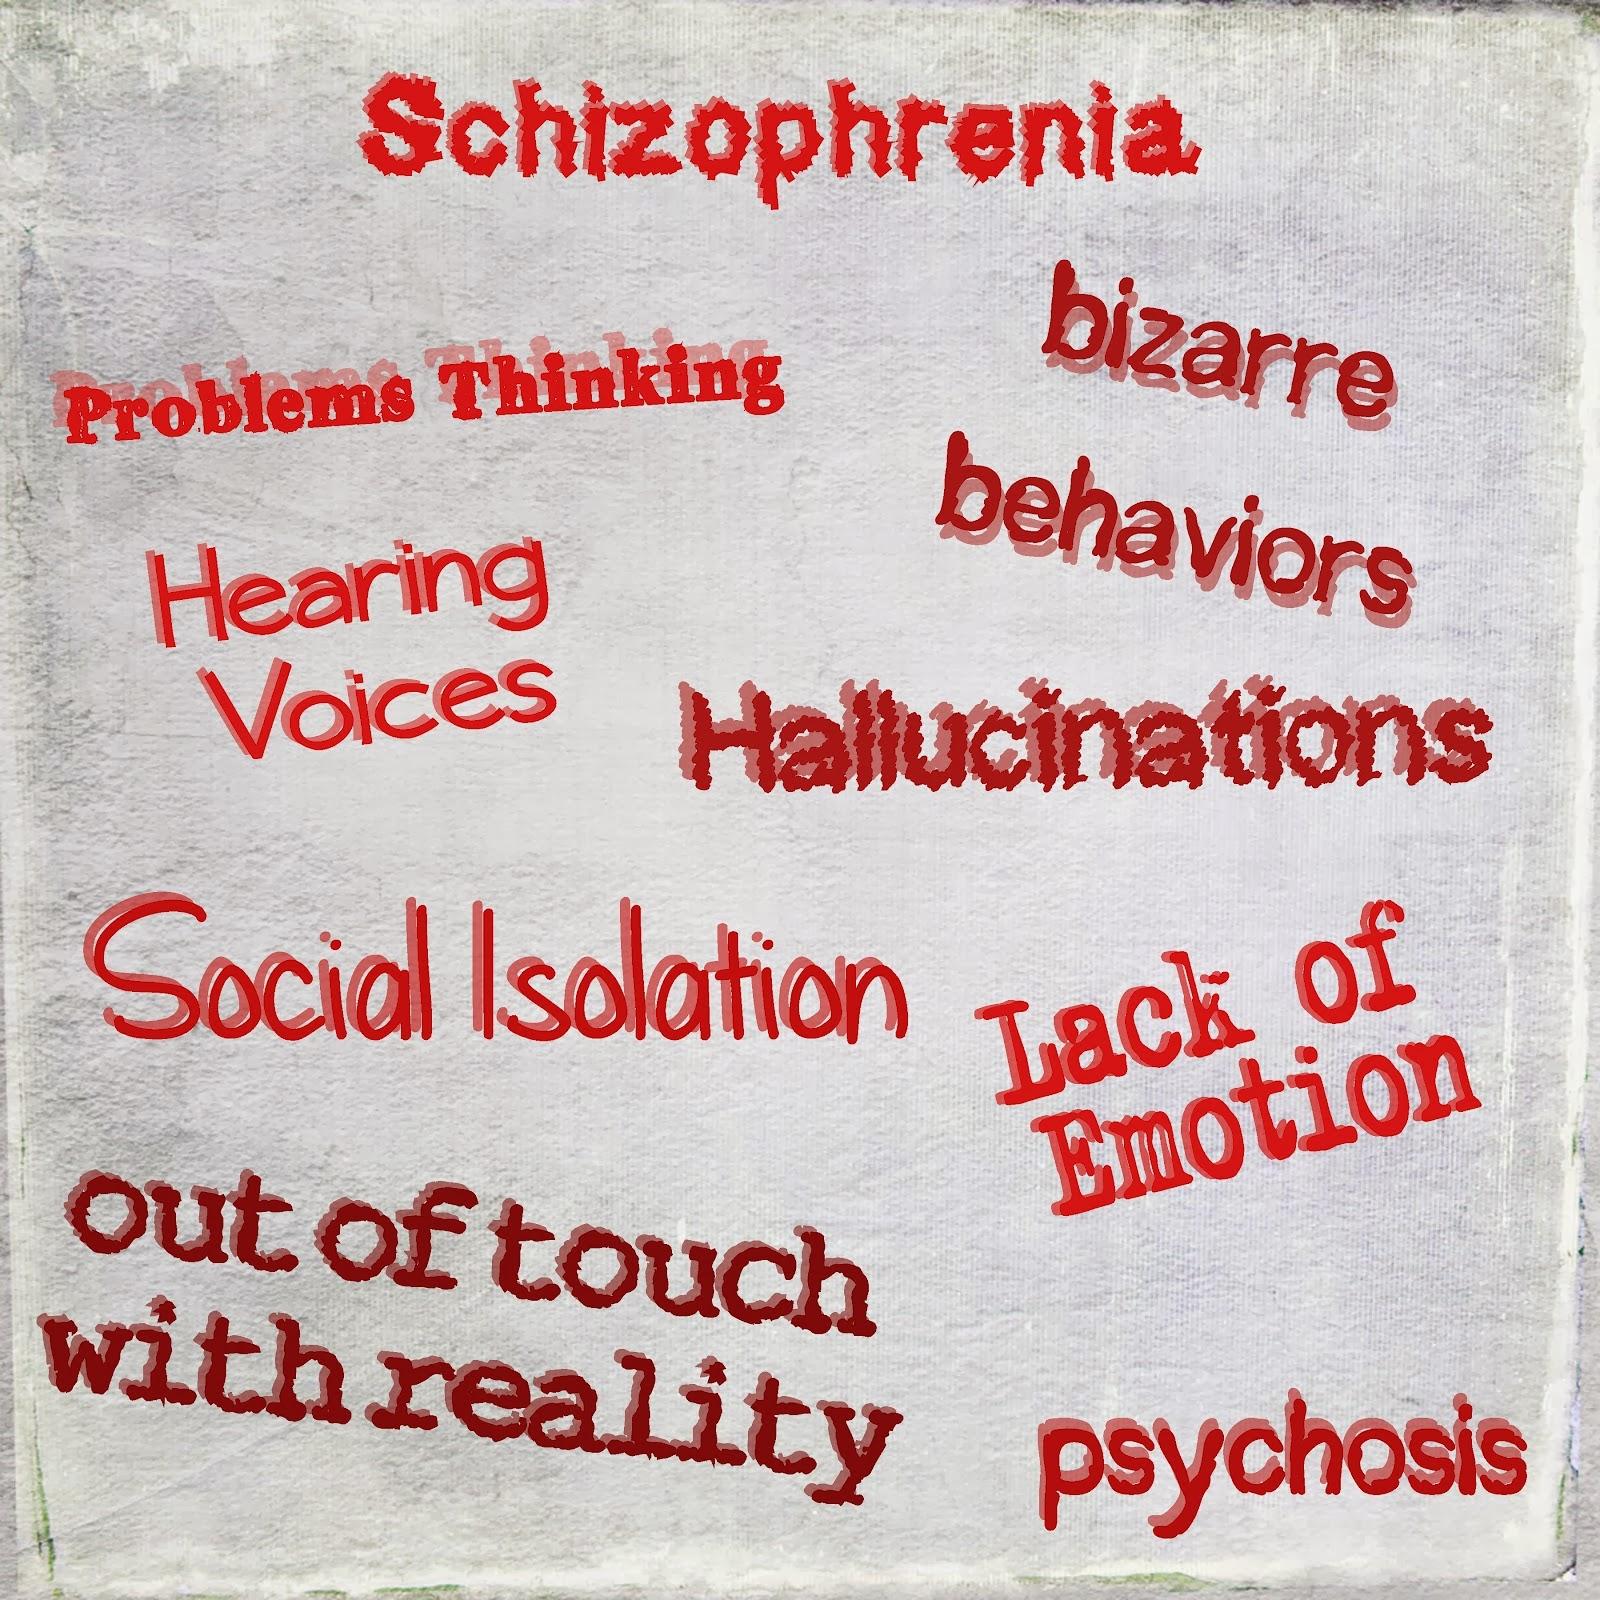 schizophrenia - photo #17